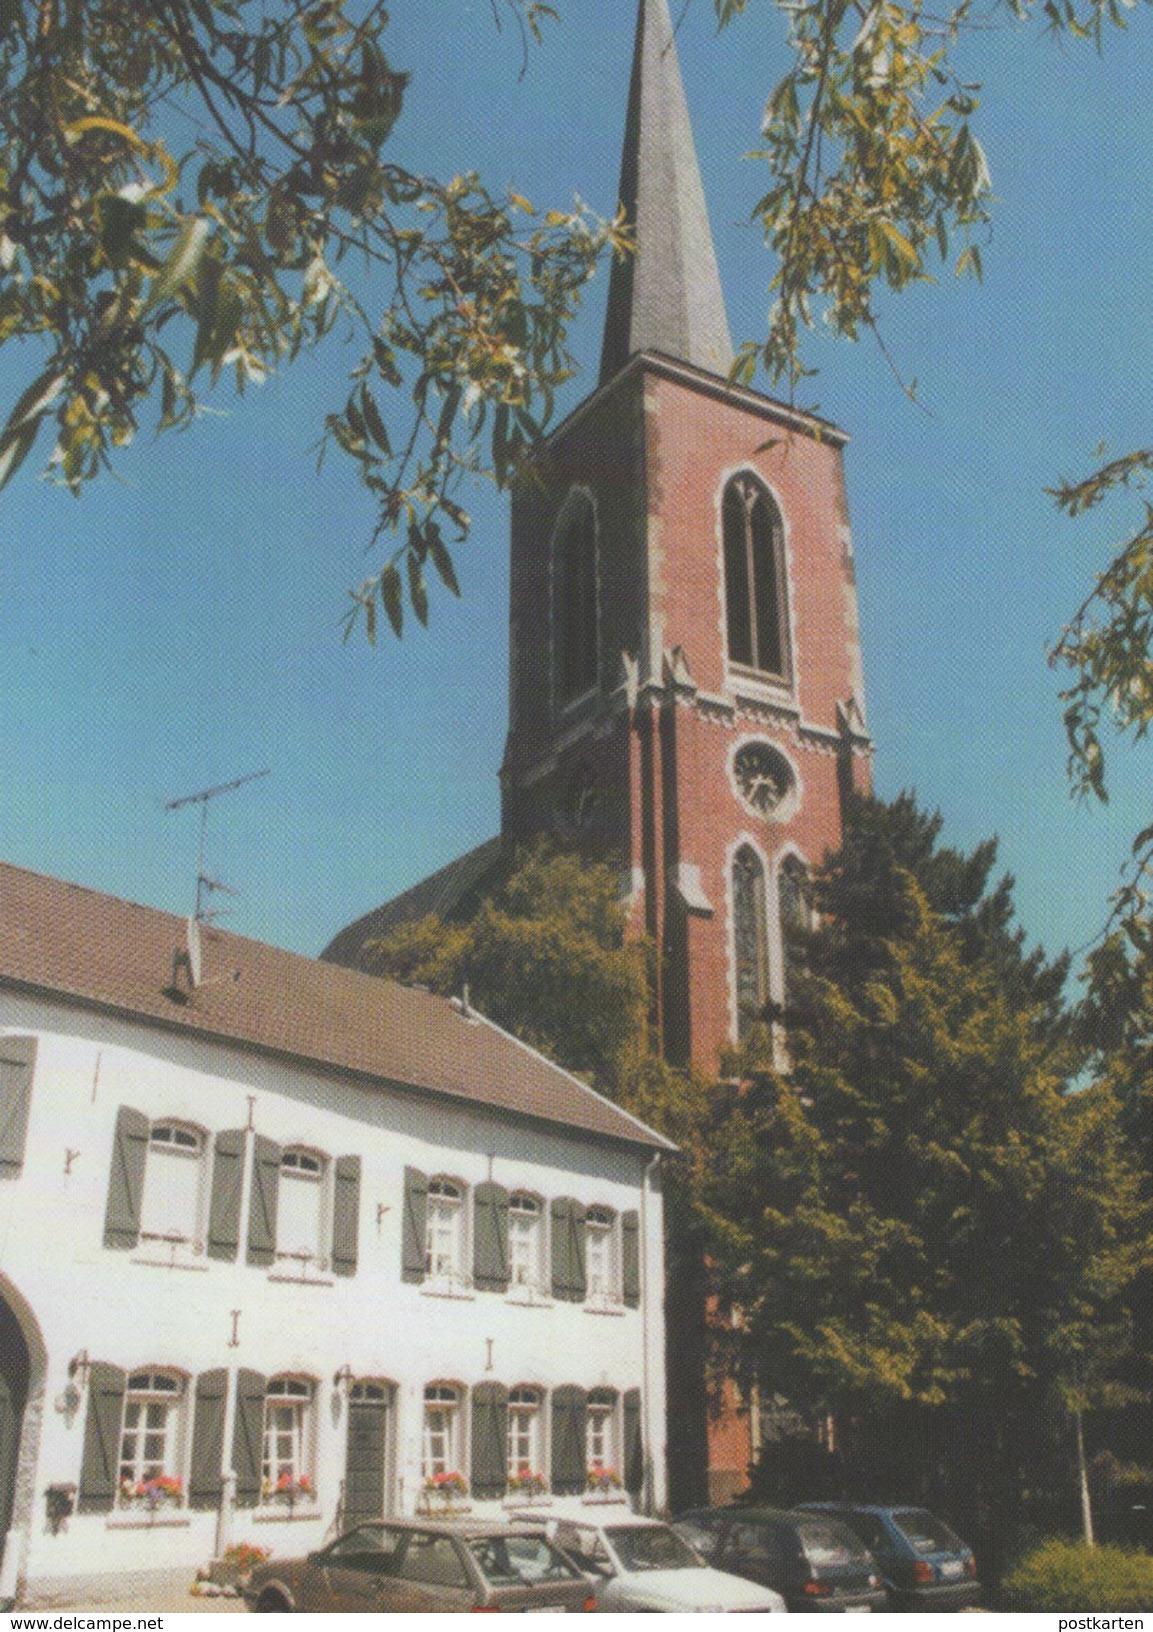 ÄLTERE POSTKARTE BAUDENKMAL IN BARDENBERG MIT PFARRKIRCHE ST. PETER UND PAUL SPD WÜRSELEN PARTEI Cpa AK Postcard - Würselen